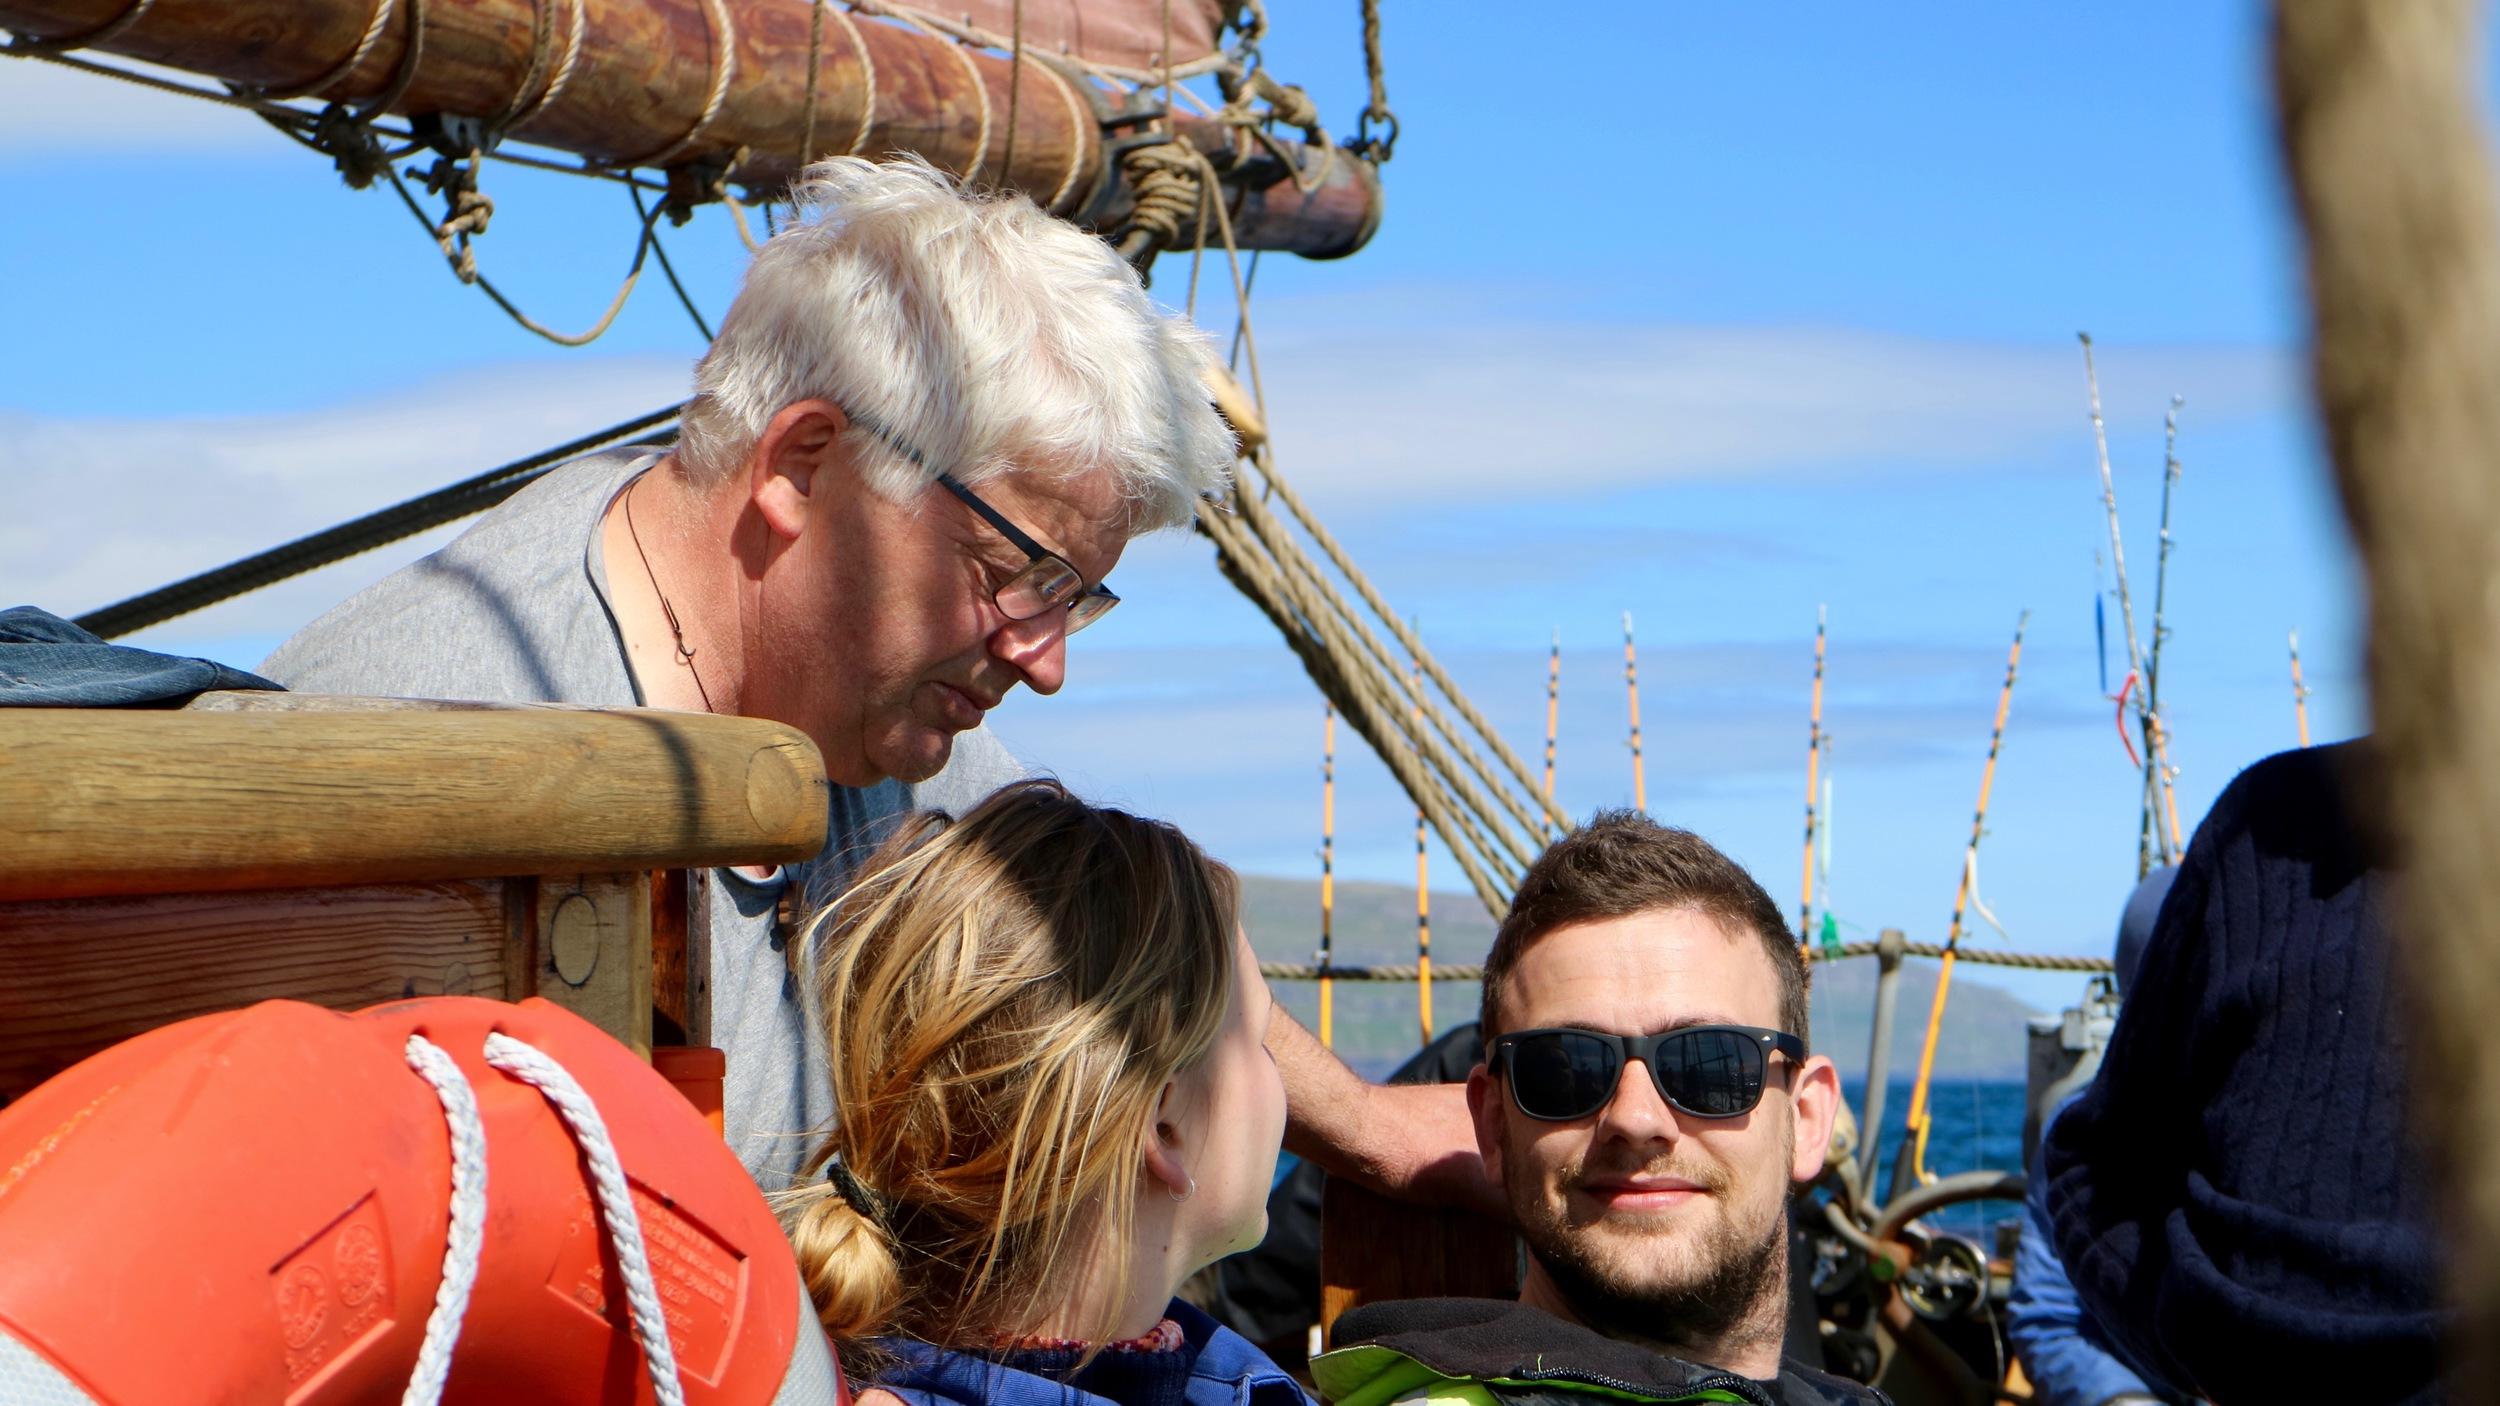 Hands, friends and skipper: Birgir Enni, Petra Mathilde Jørs and Petur Vágsgarð